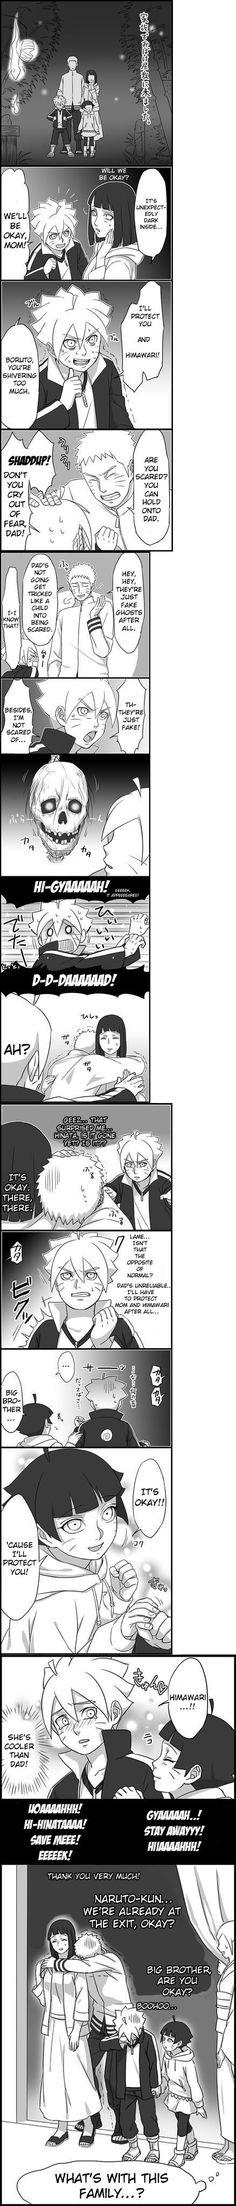 Halloween!! Aww Naruto's so cute hanging on to Hinata like that!